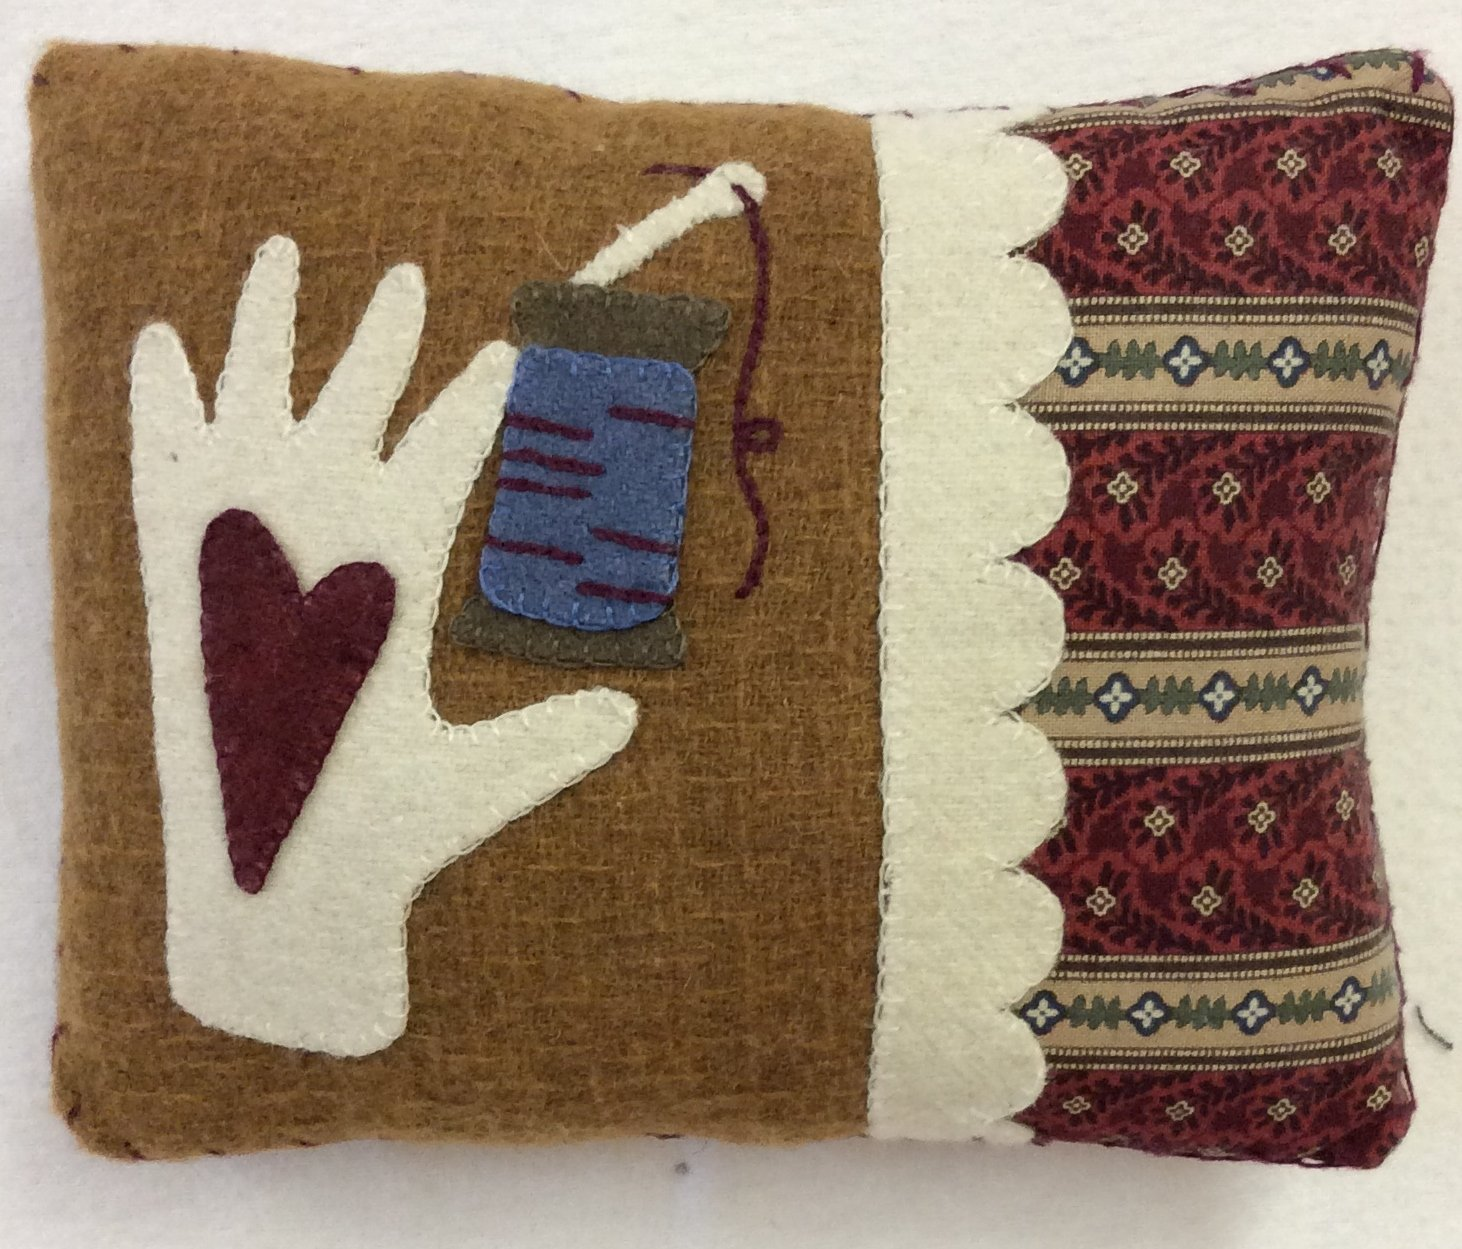 Heart and Hand Buttermilk Basin -- PGK